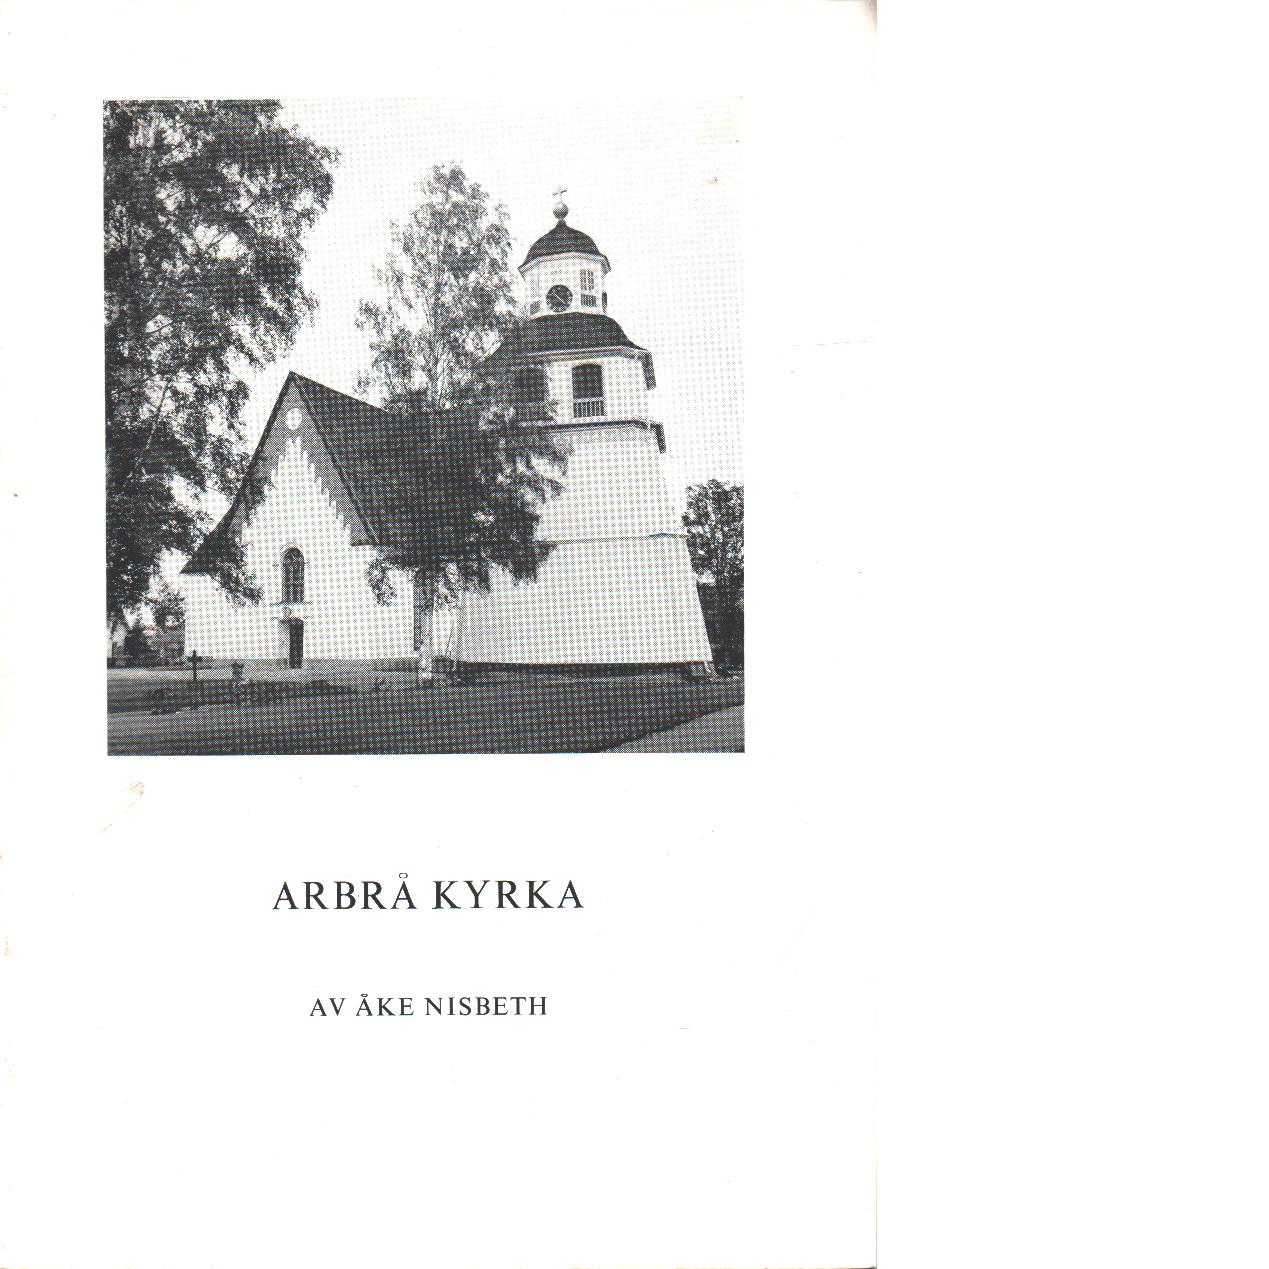 Arbrå kyrka - Nisbeth, Åke